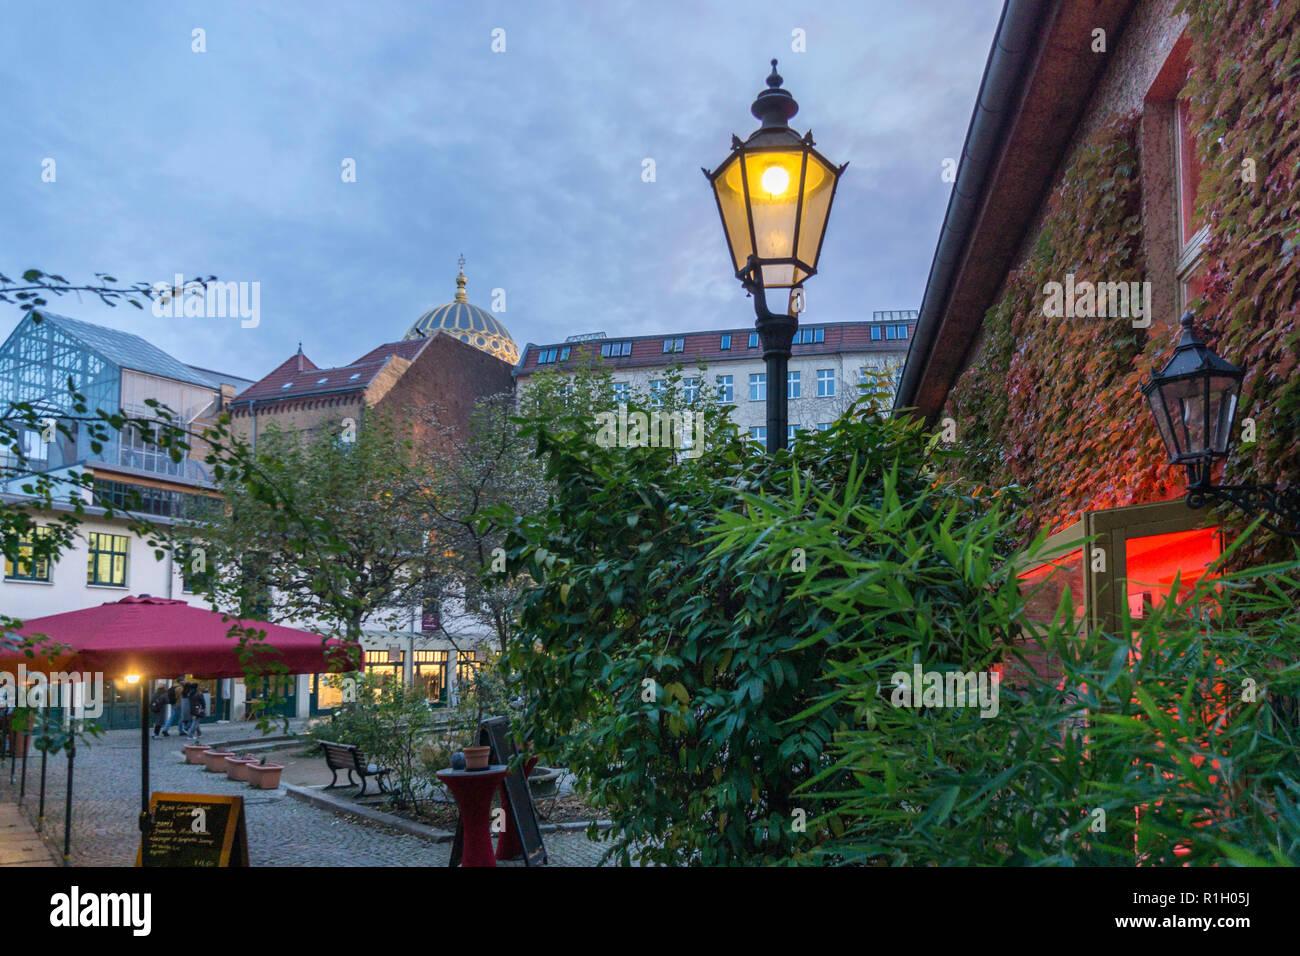 Heckmann courtyards , Heckmannhoefe,  twilight, - Stock Image